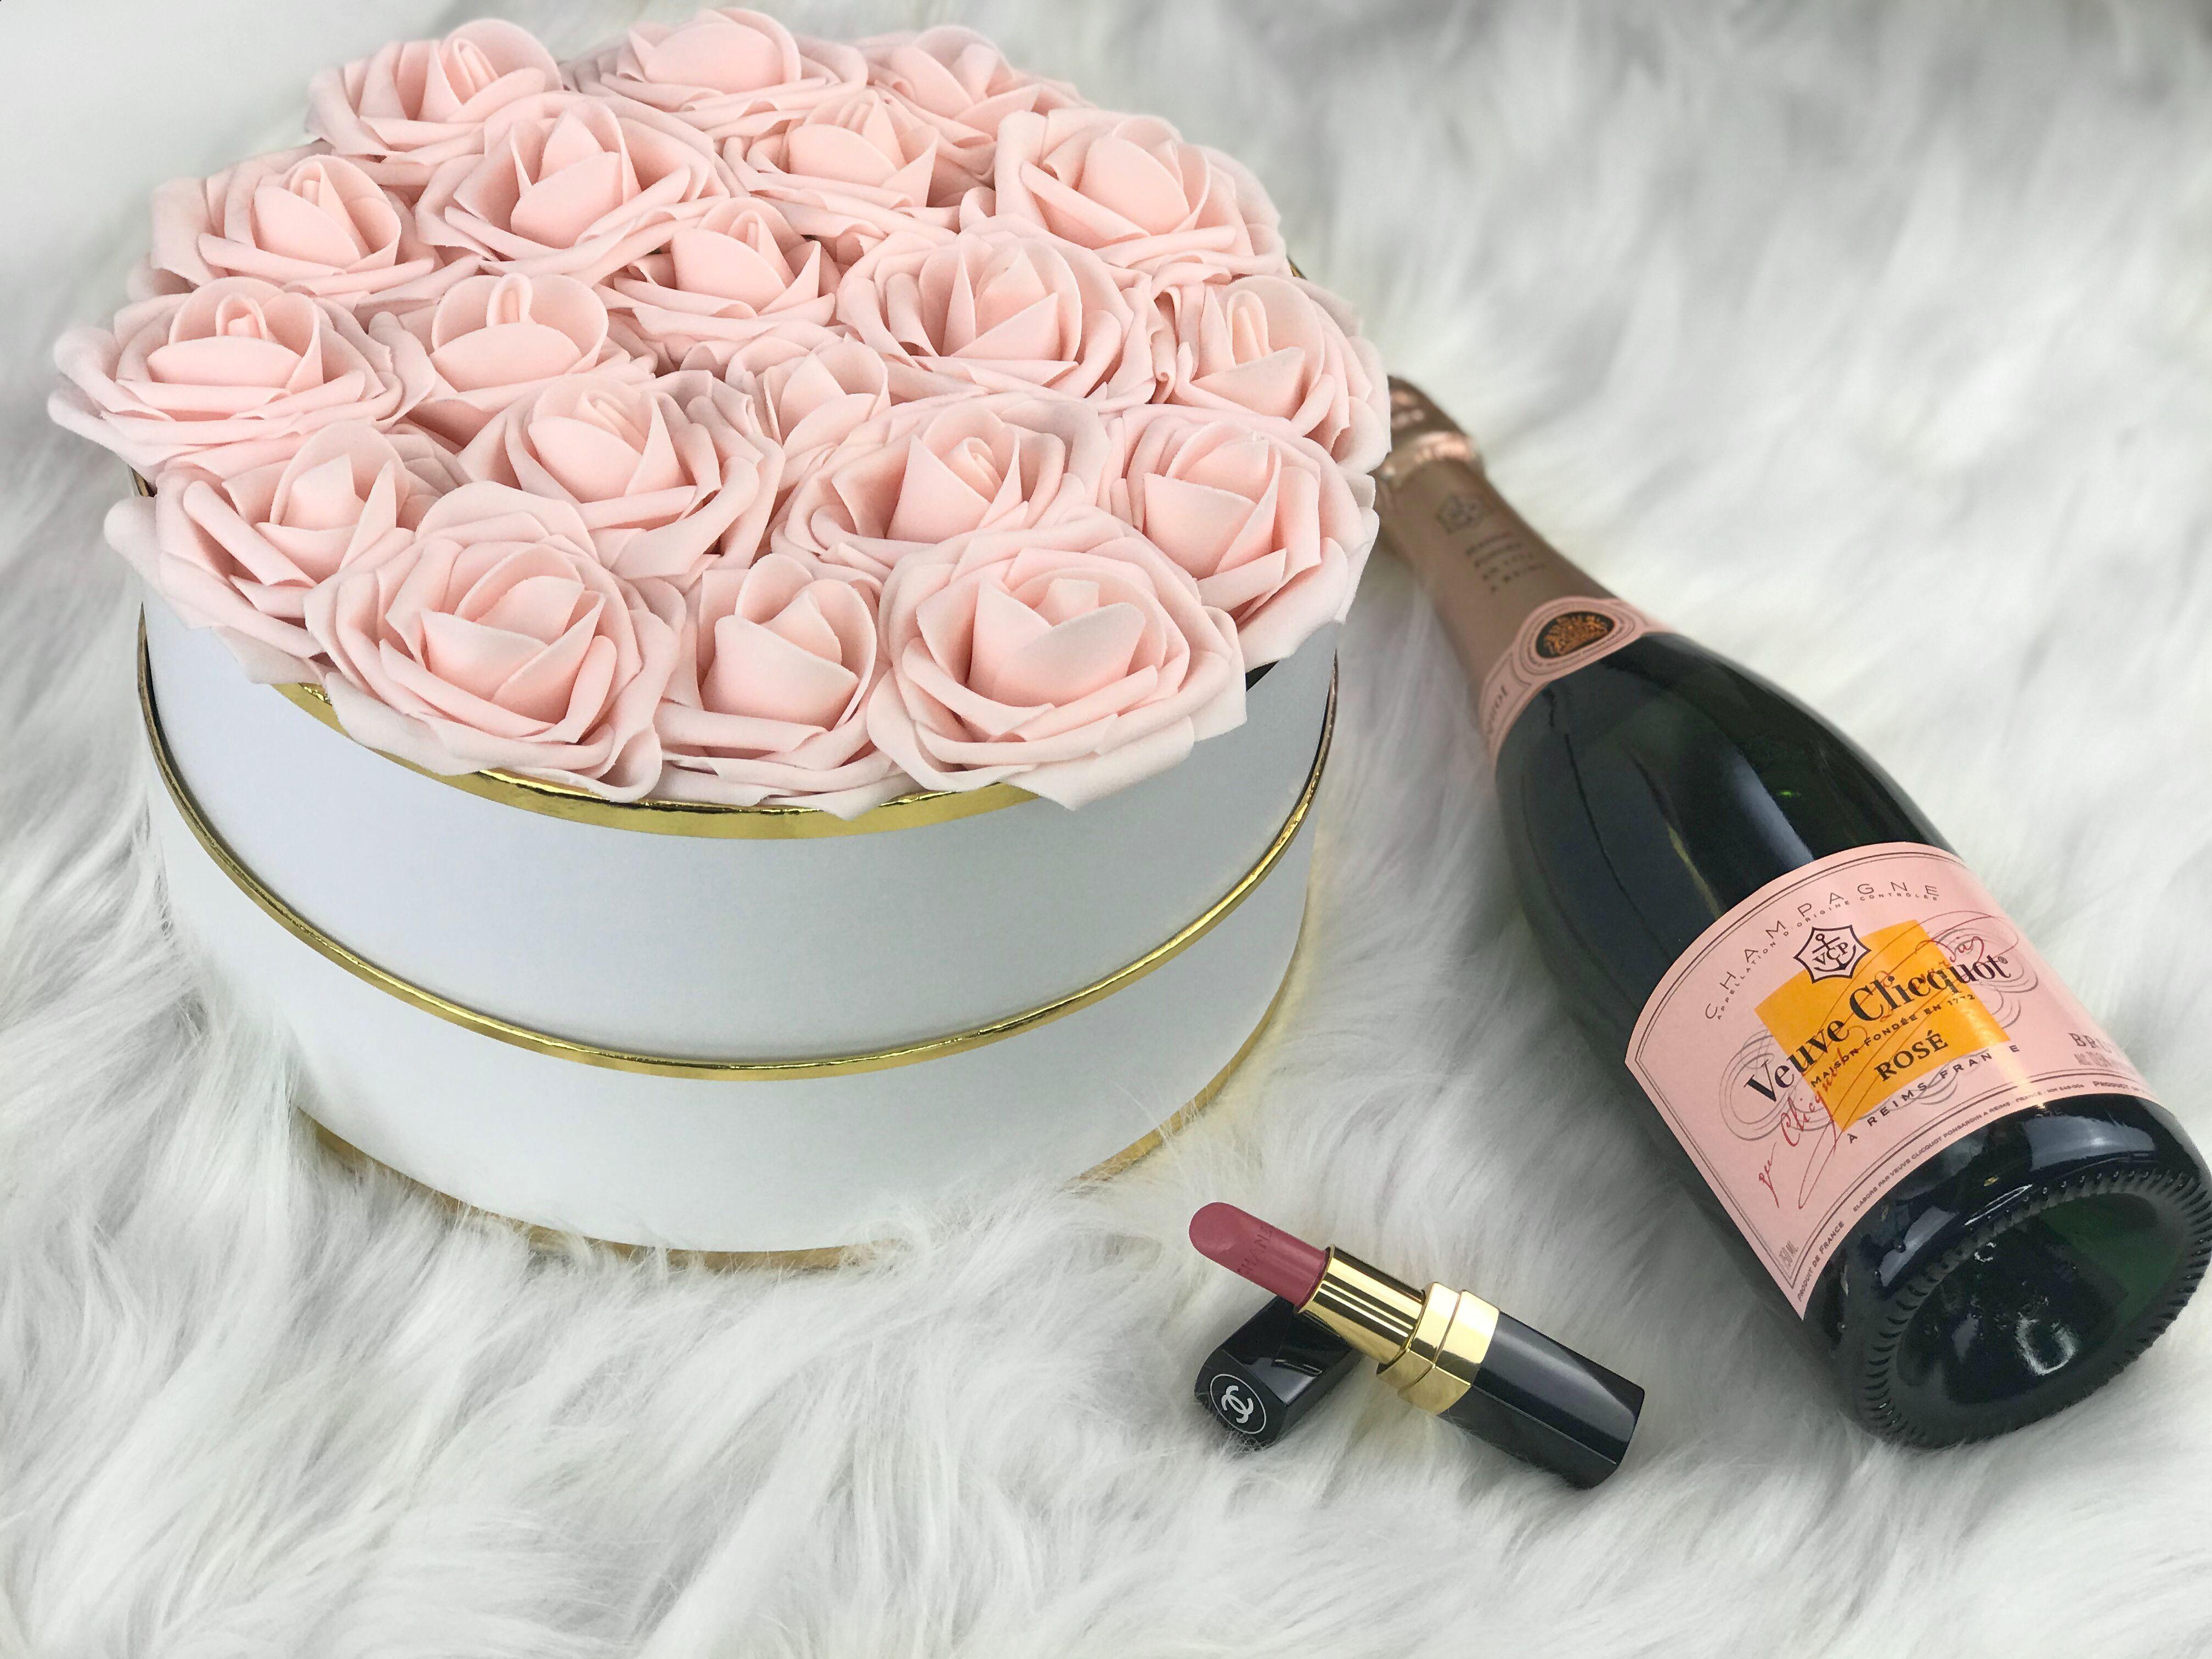 Diy Rose Box Diy Valentines Day Gift How To Make A Tumblr Inspired Rose Box Diy Roses Valentine S Day Diy Diy Box